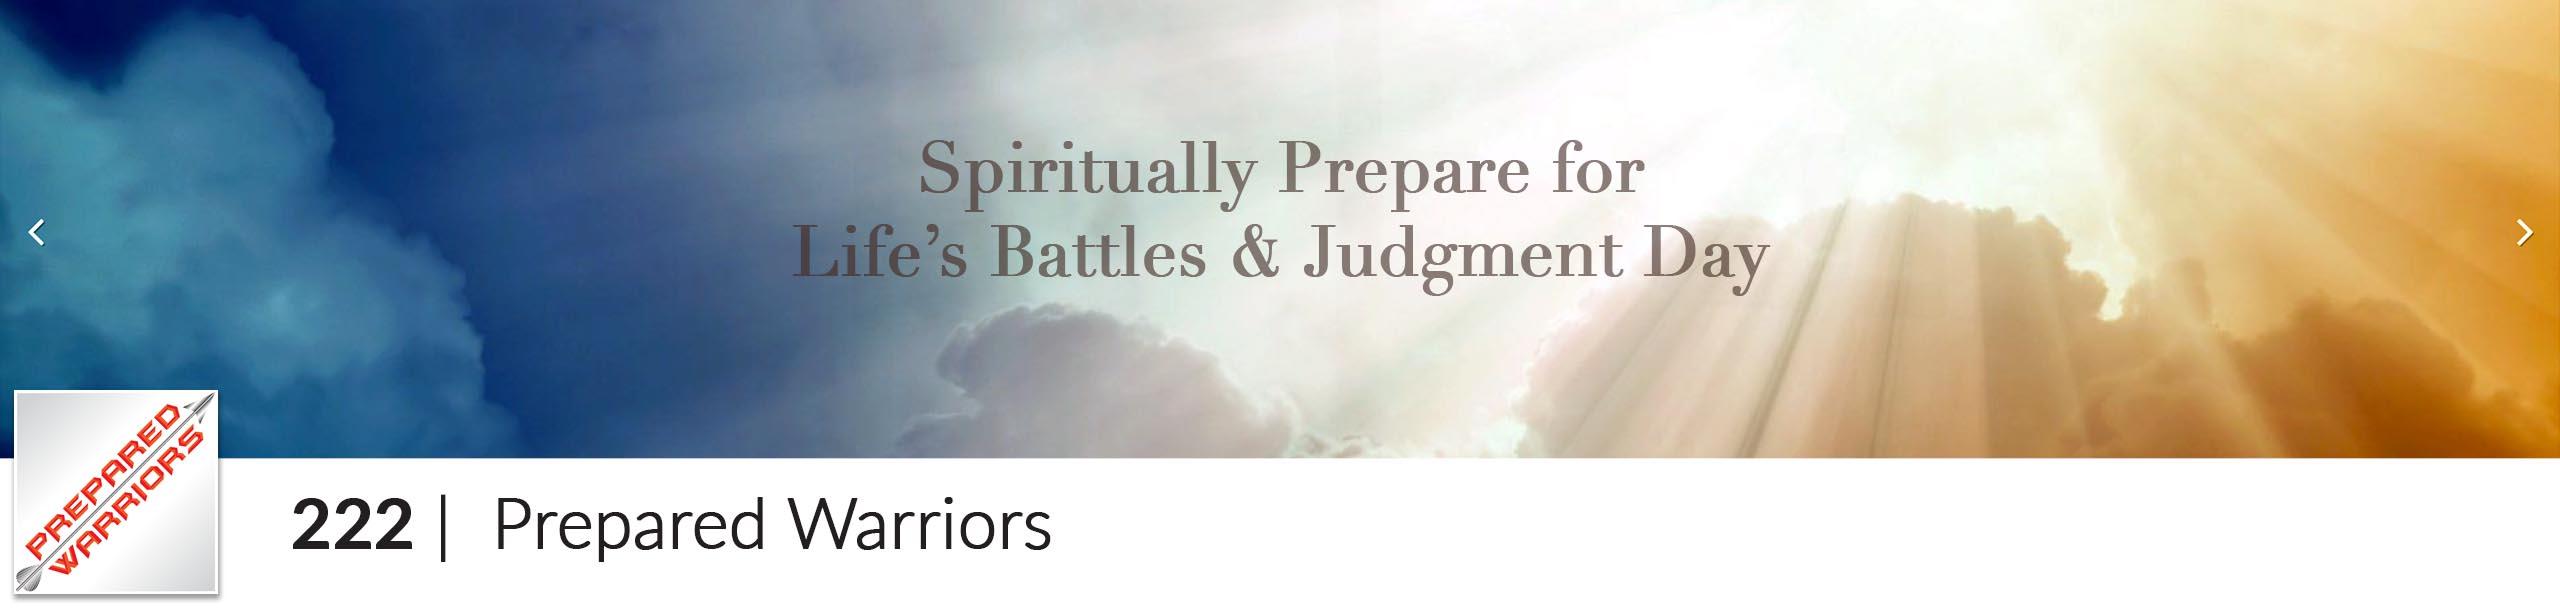 PreparedWarriors_header1